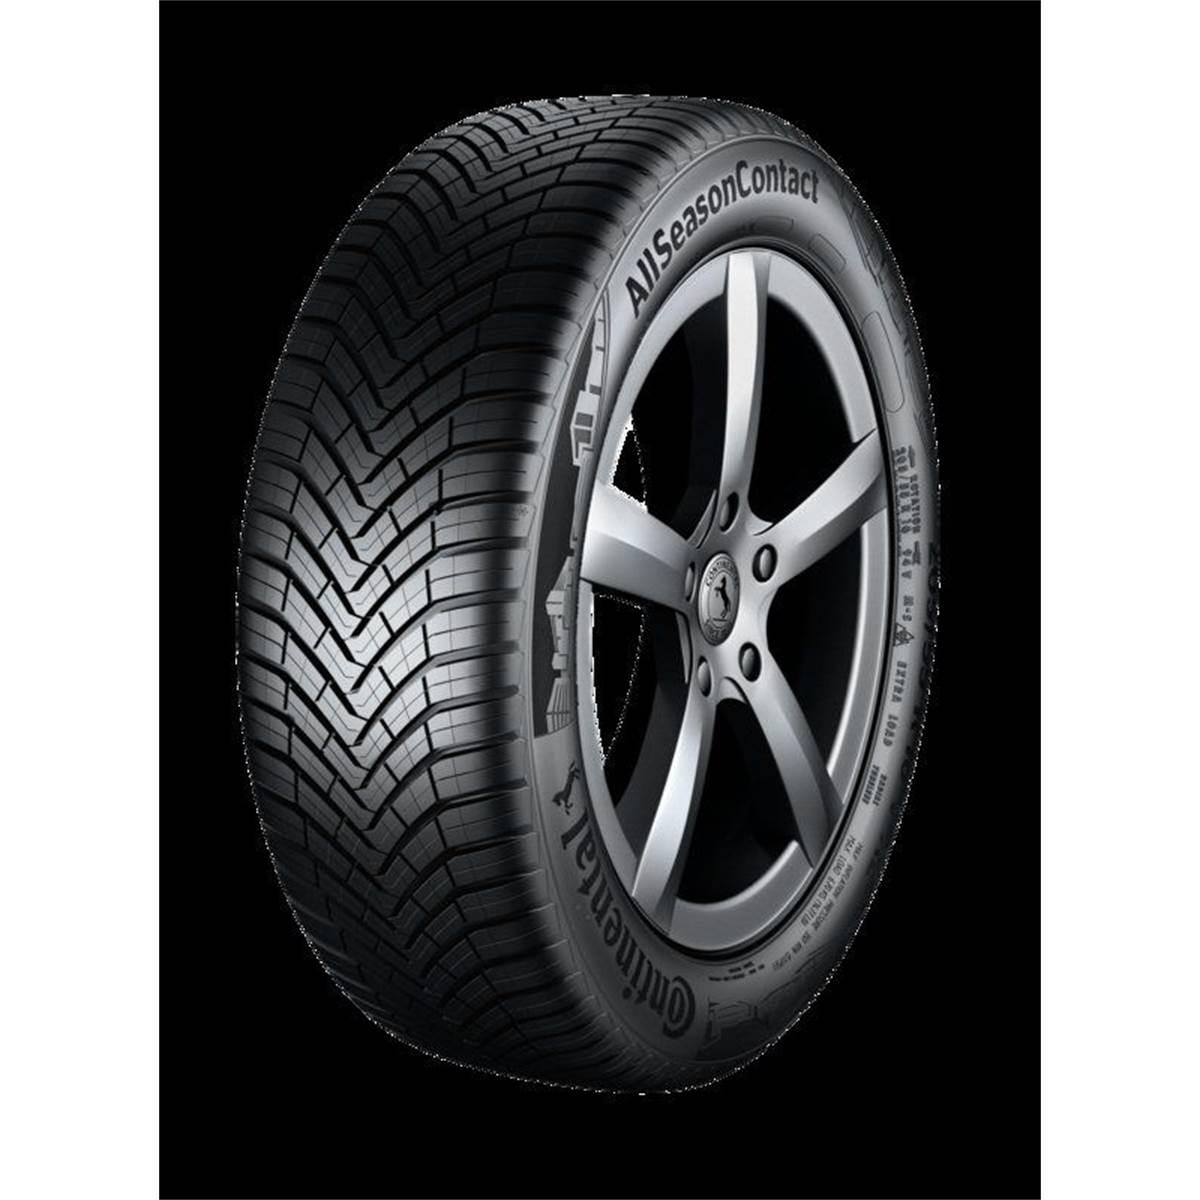 Continental All Season Contact Xl pneu